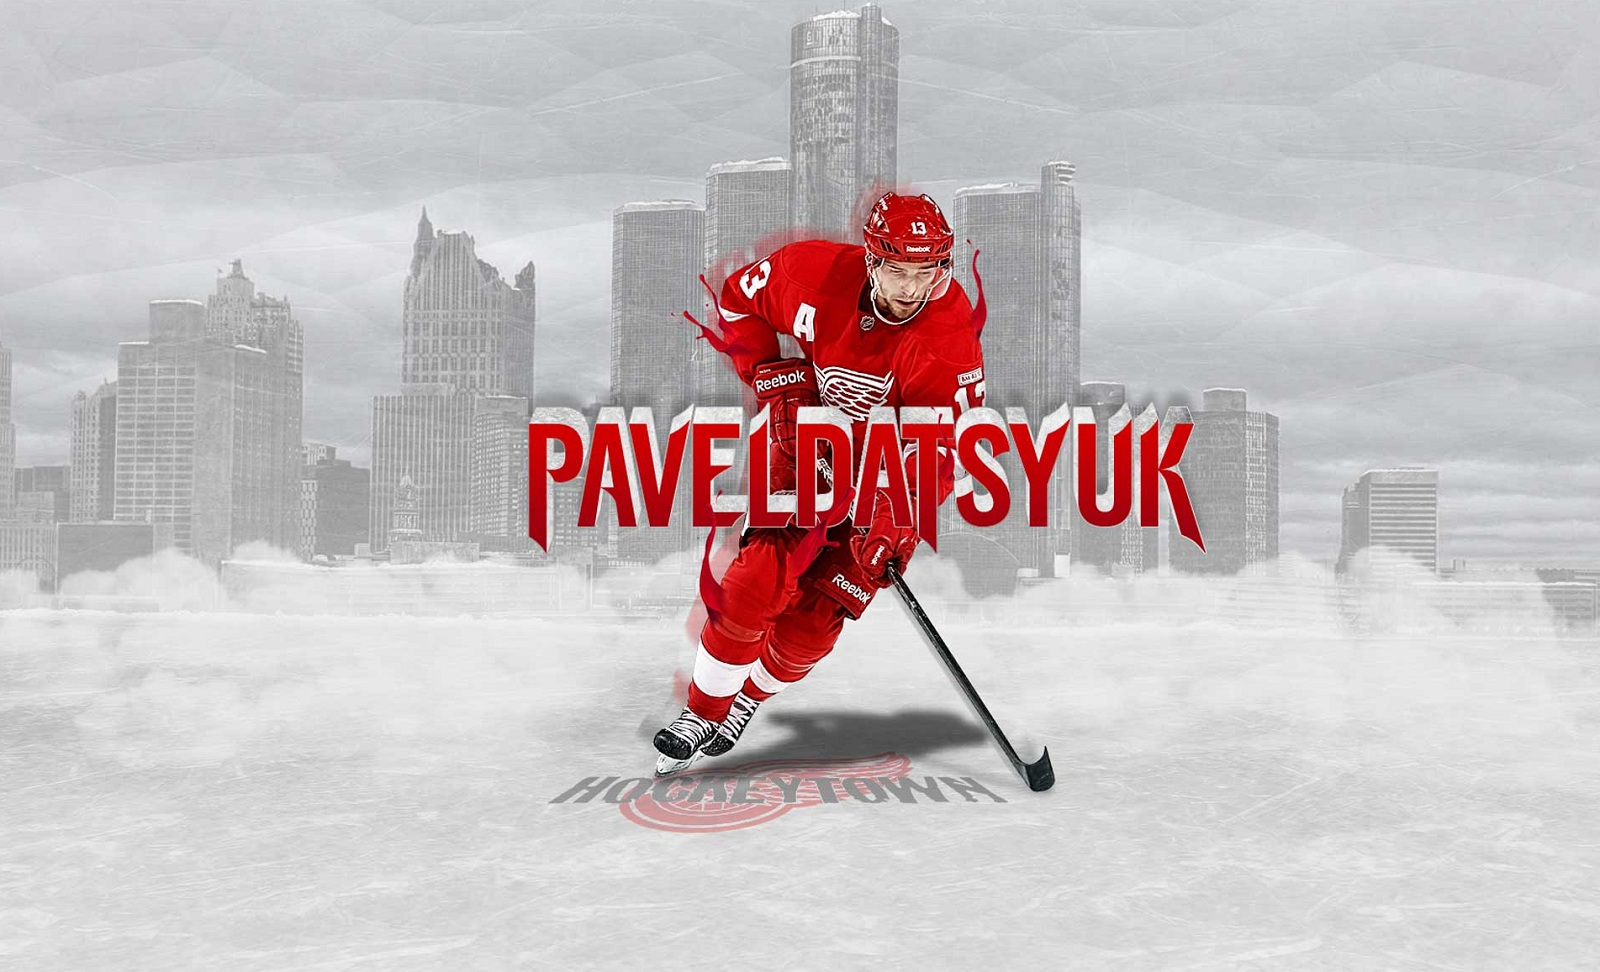 Hockey Pavel Datsyuk Detroit Red Wings wallpaper 1600x972 1600x972